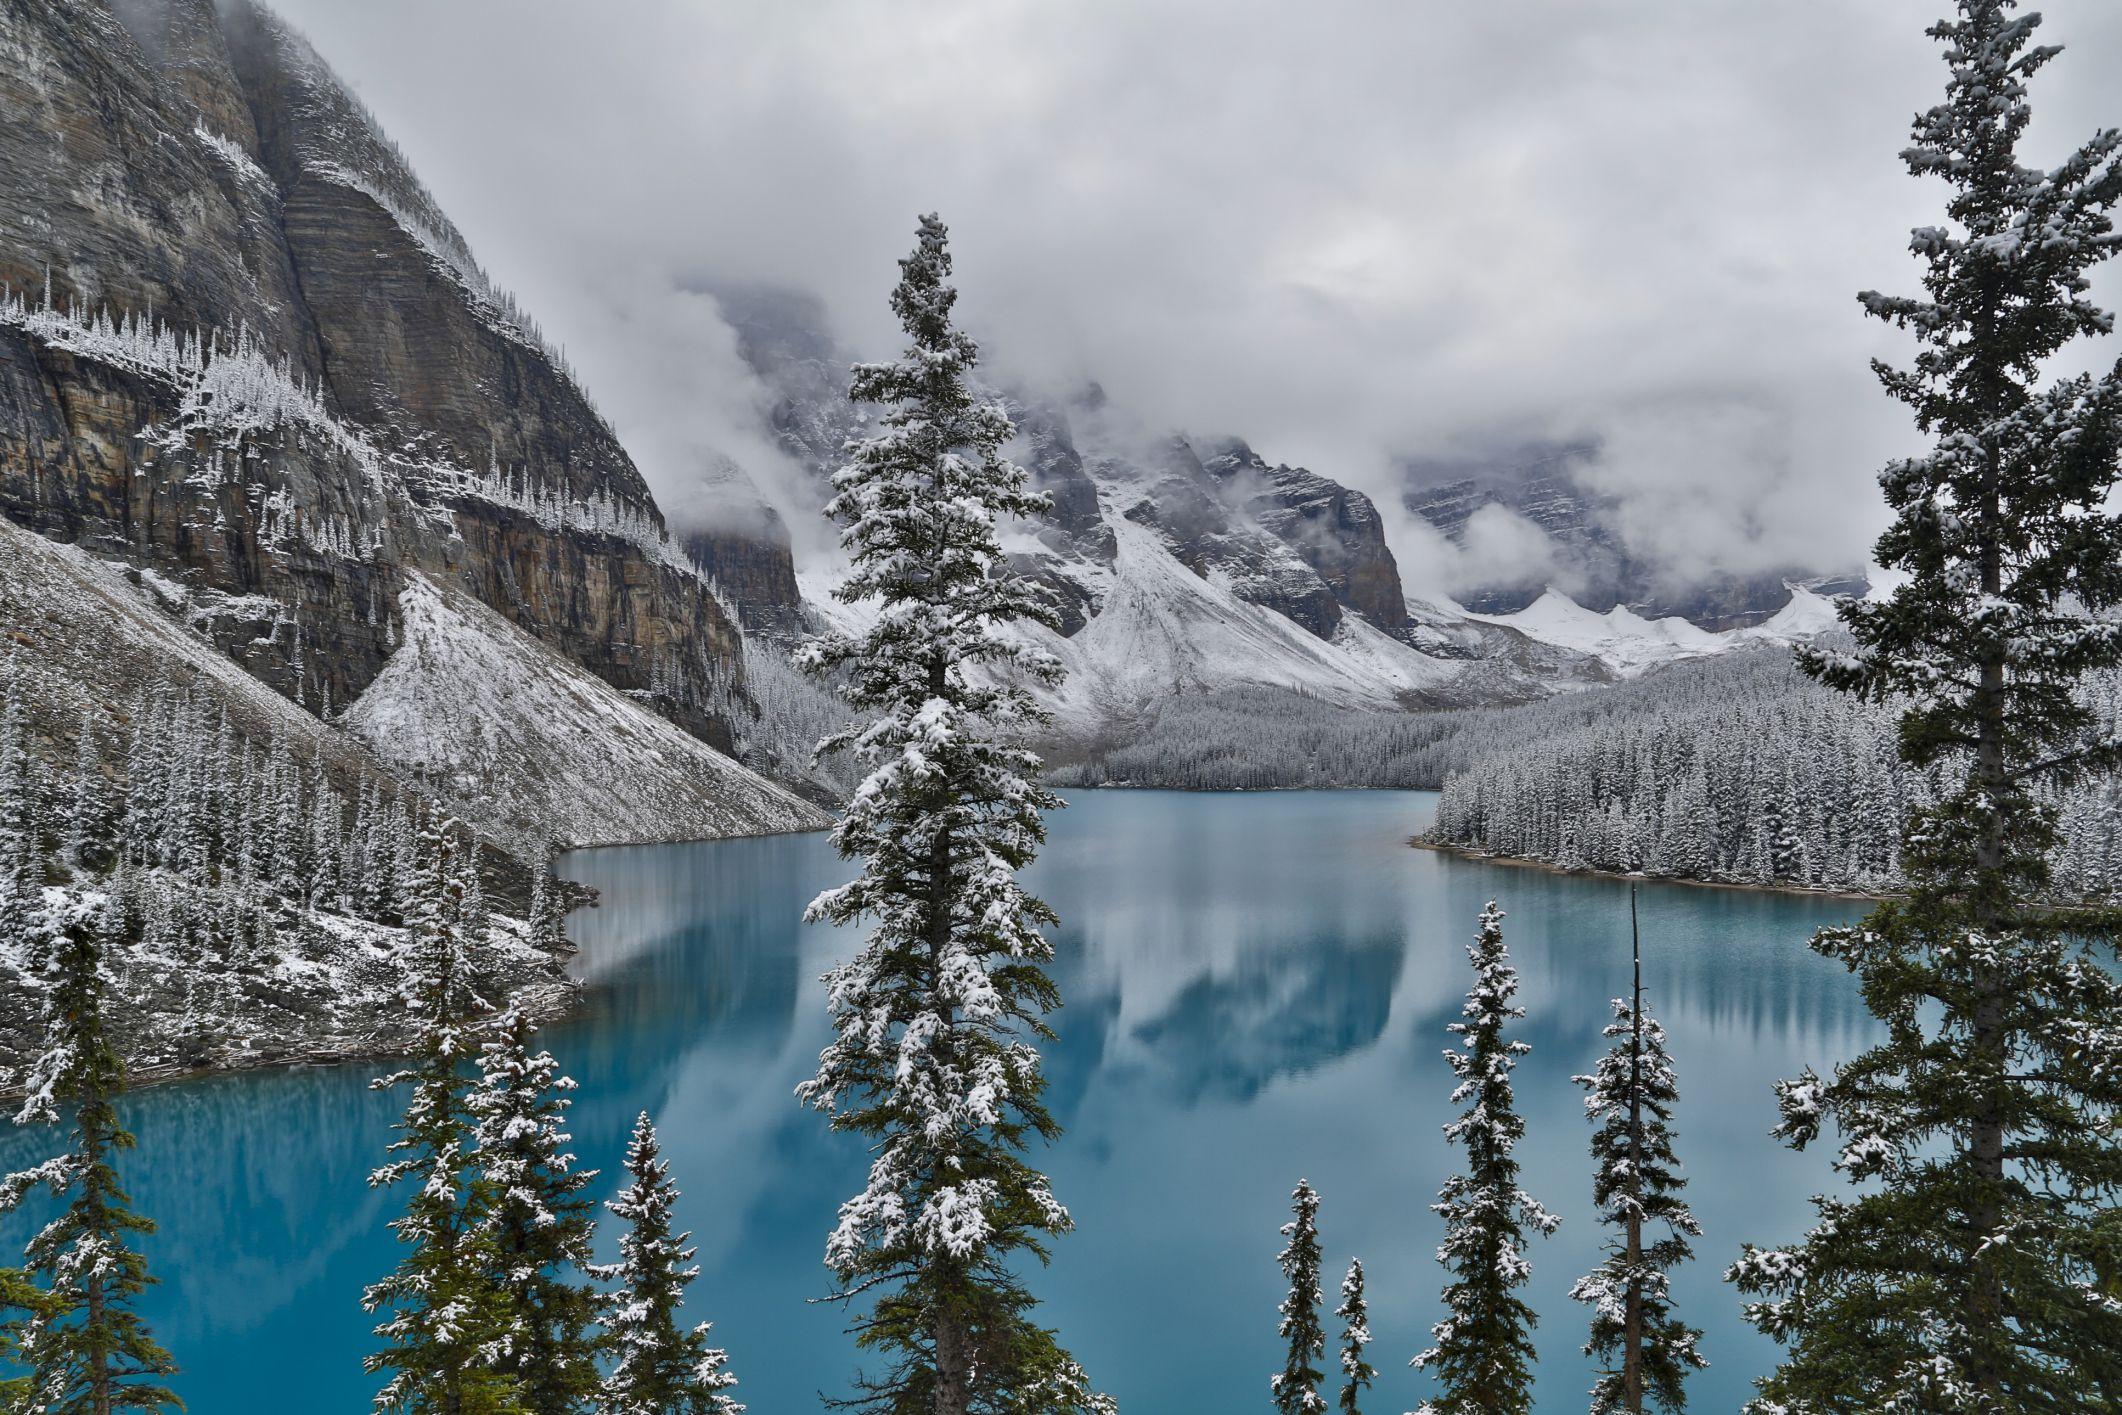 Lake Moraine Banff in winter